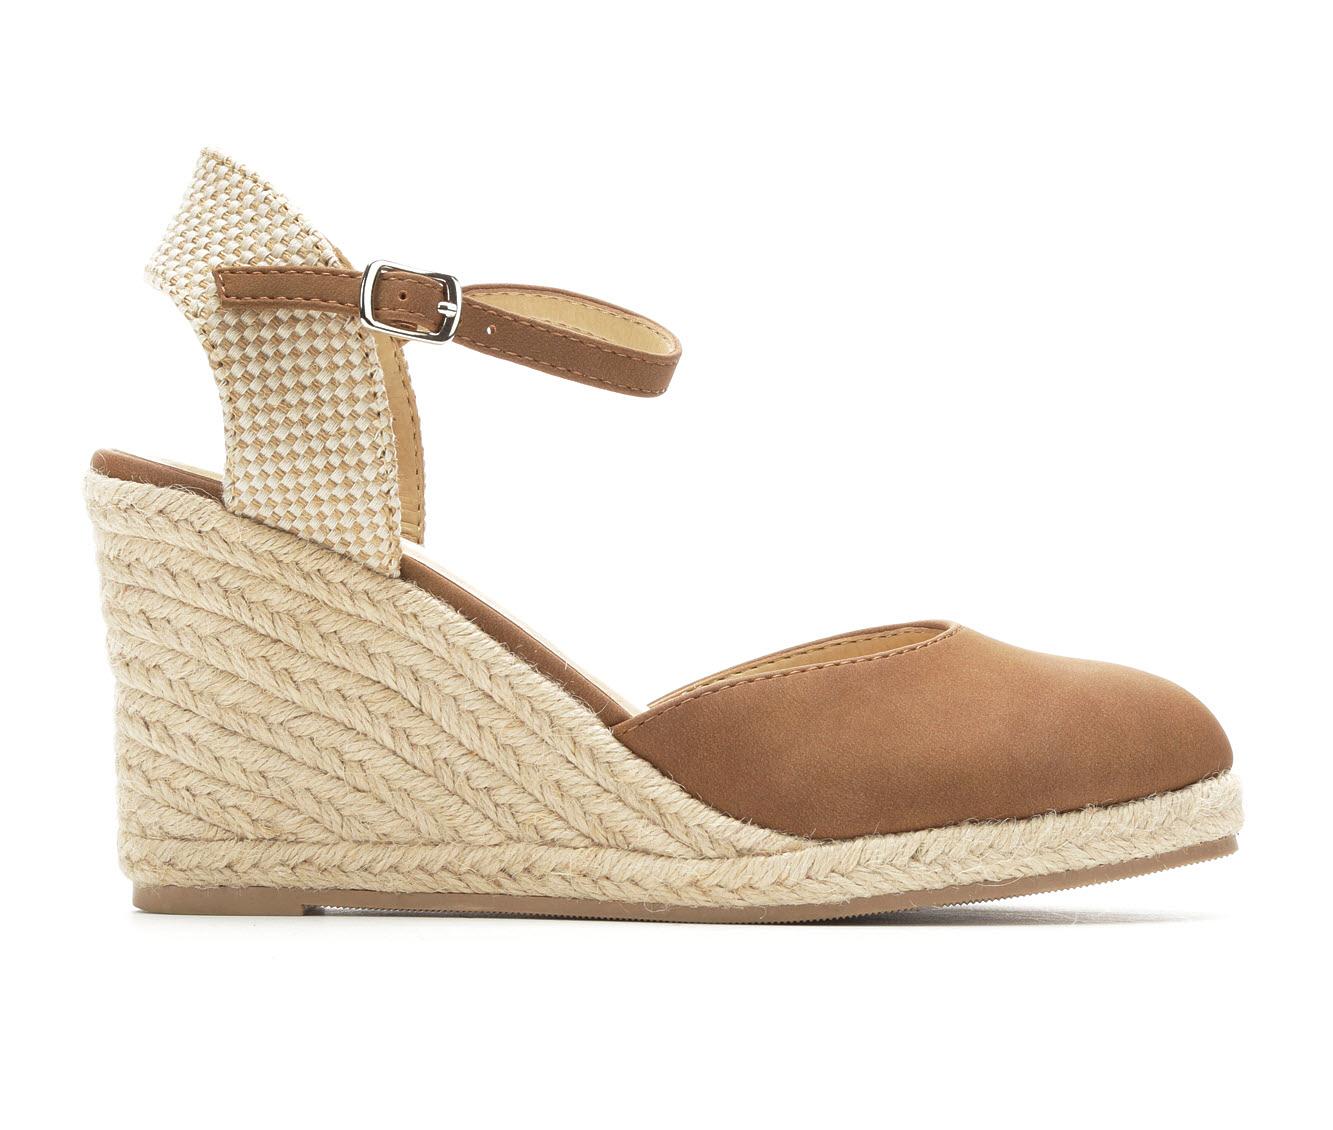 Solanz Libby Women's Dress Shoe (Brown Faux Leather)